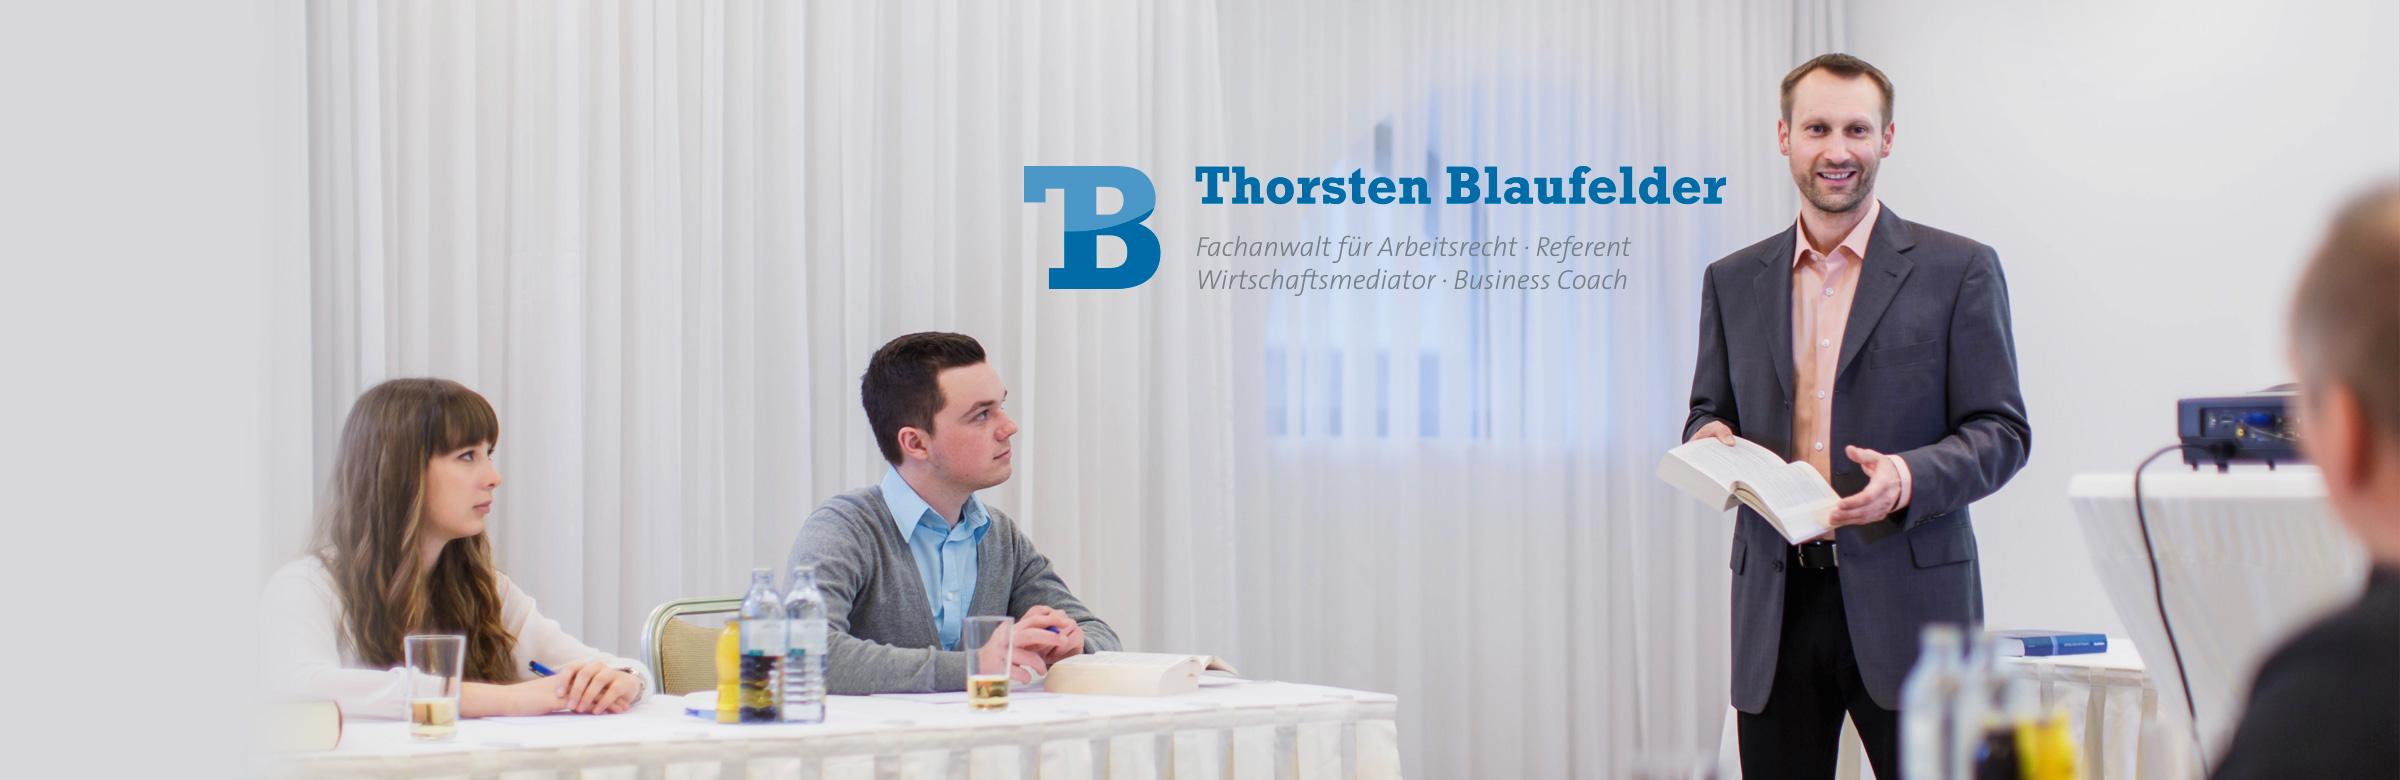 Thorsten Blaufelder - Seminare